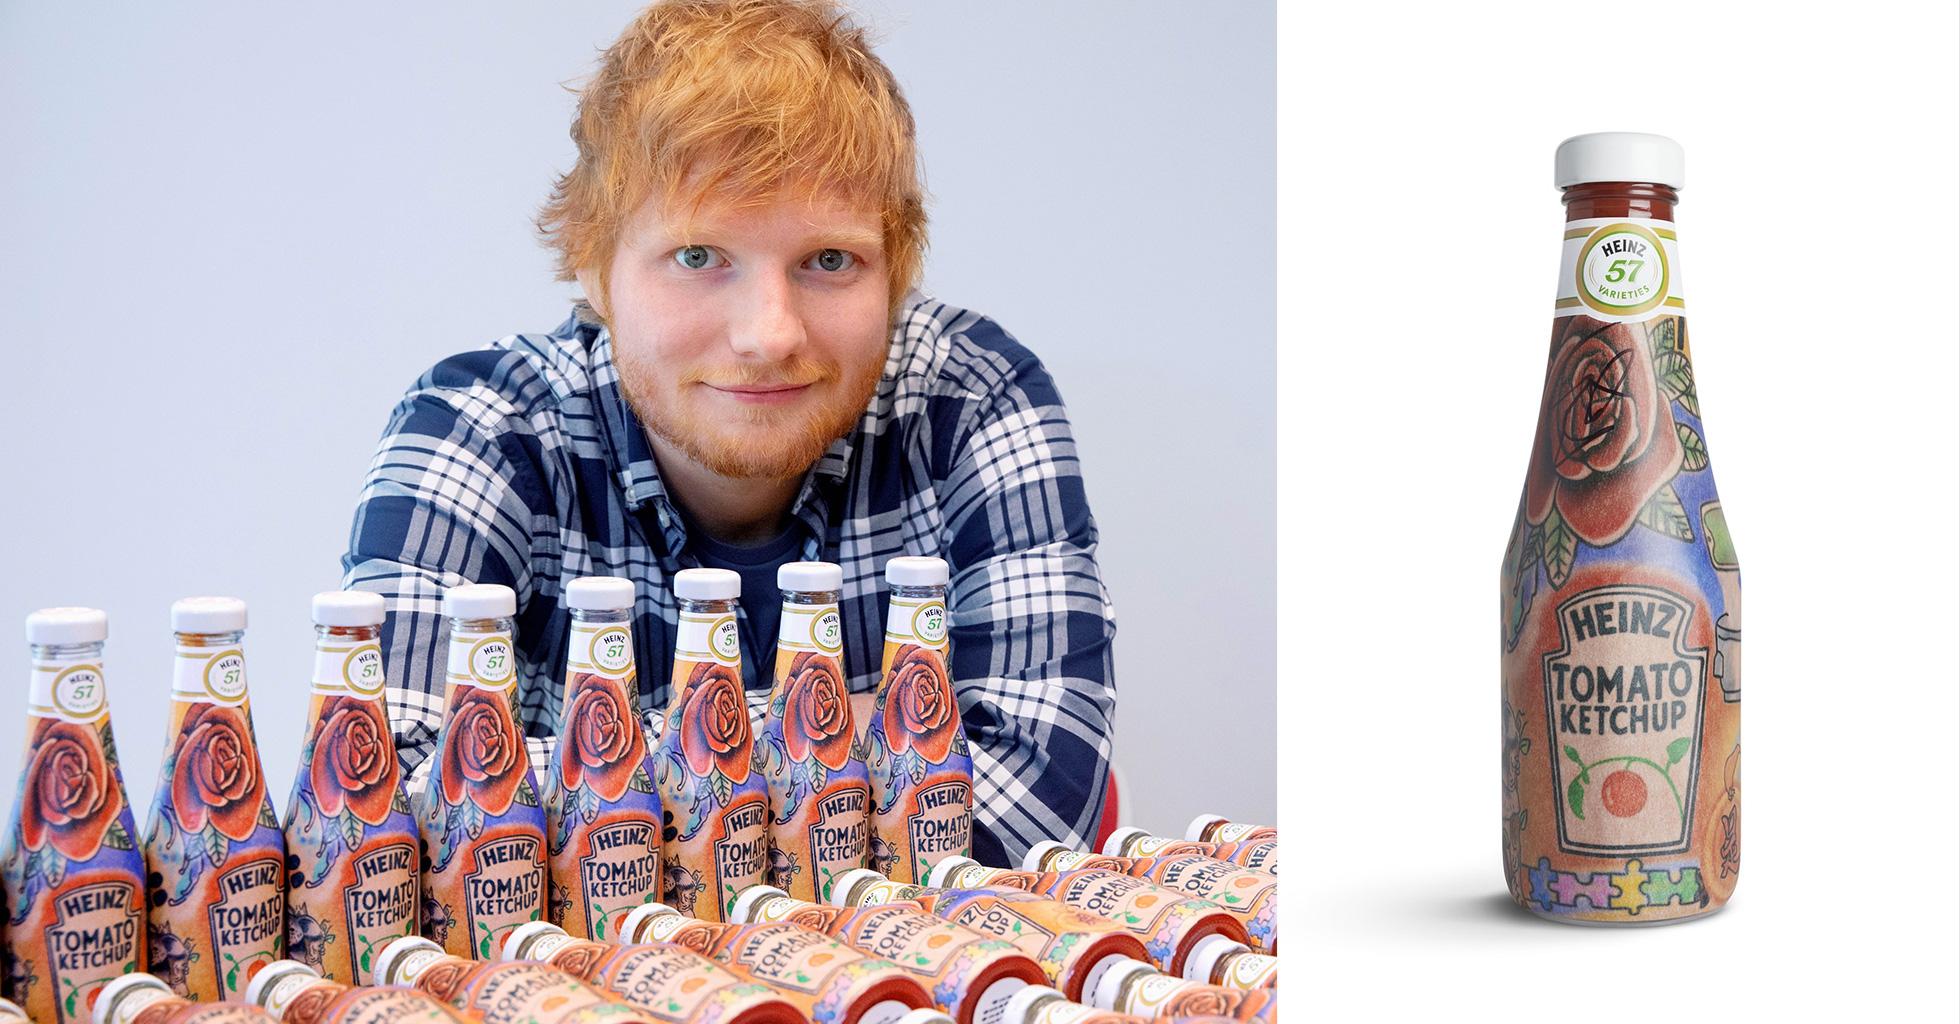 Ed Sheeran & Heinz